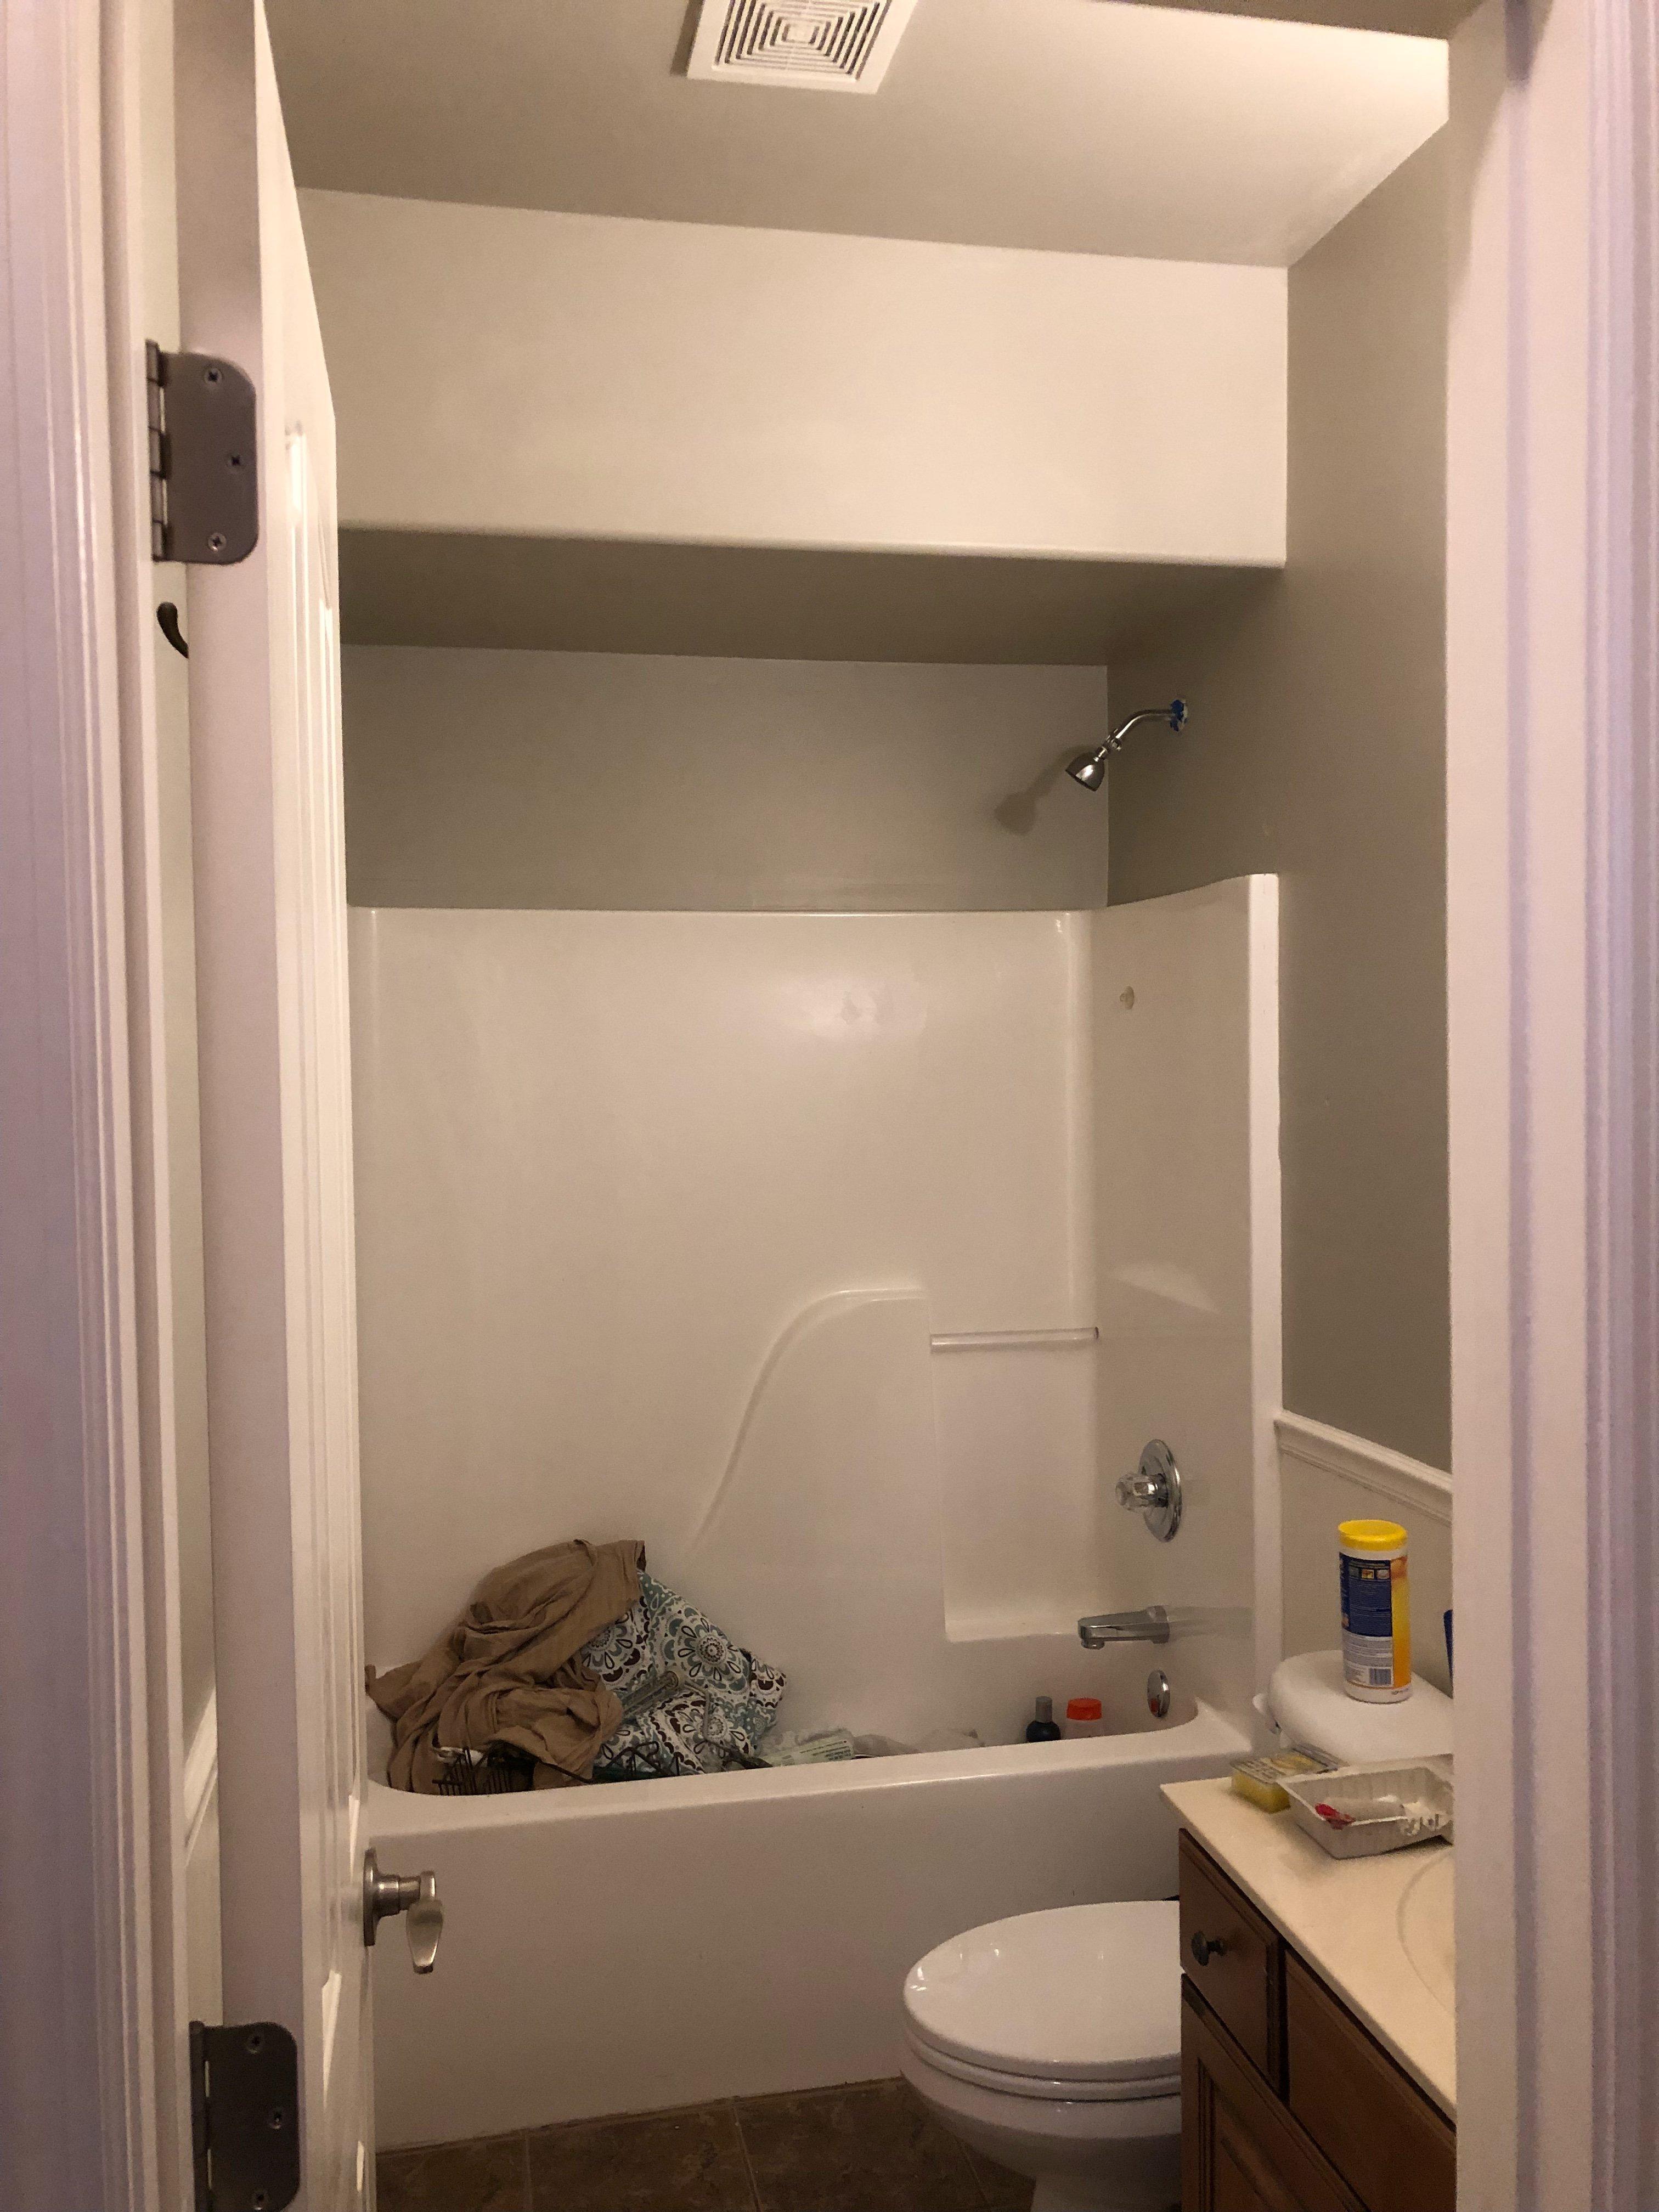 100 dollar room challenge work in progress on my bathroom makeover